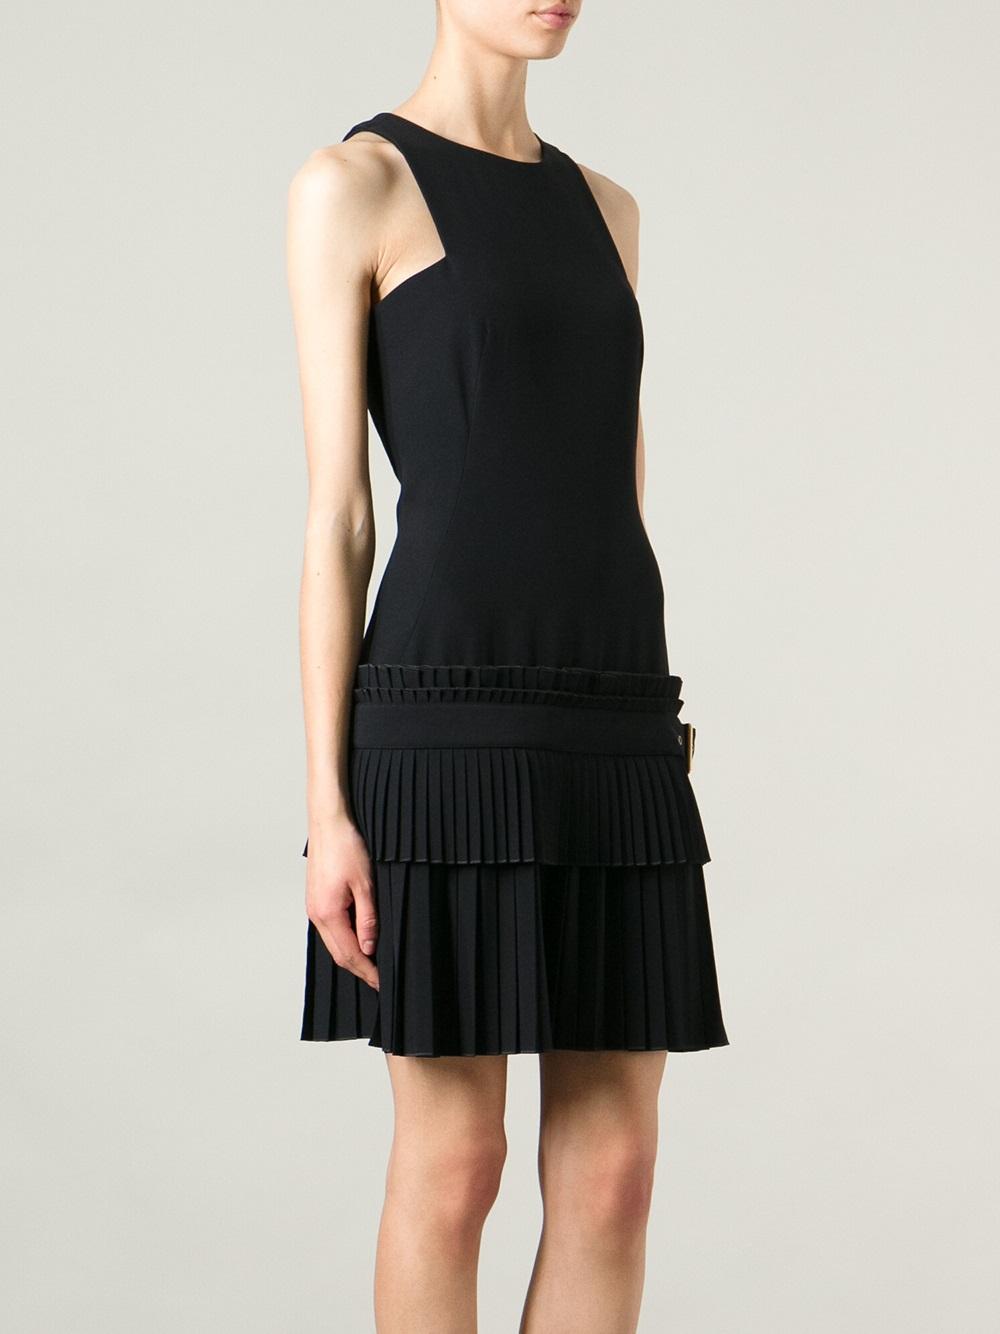 mcqueen pleated skirt dress in black lyst